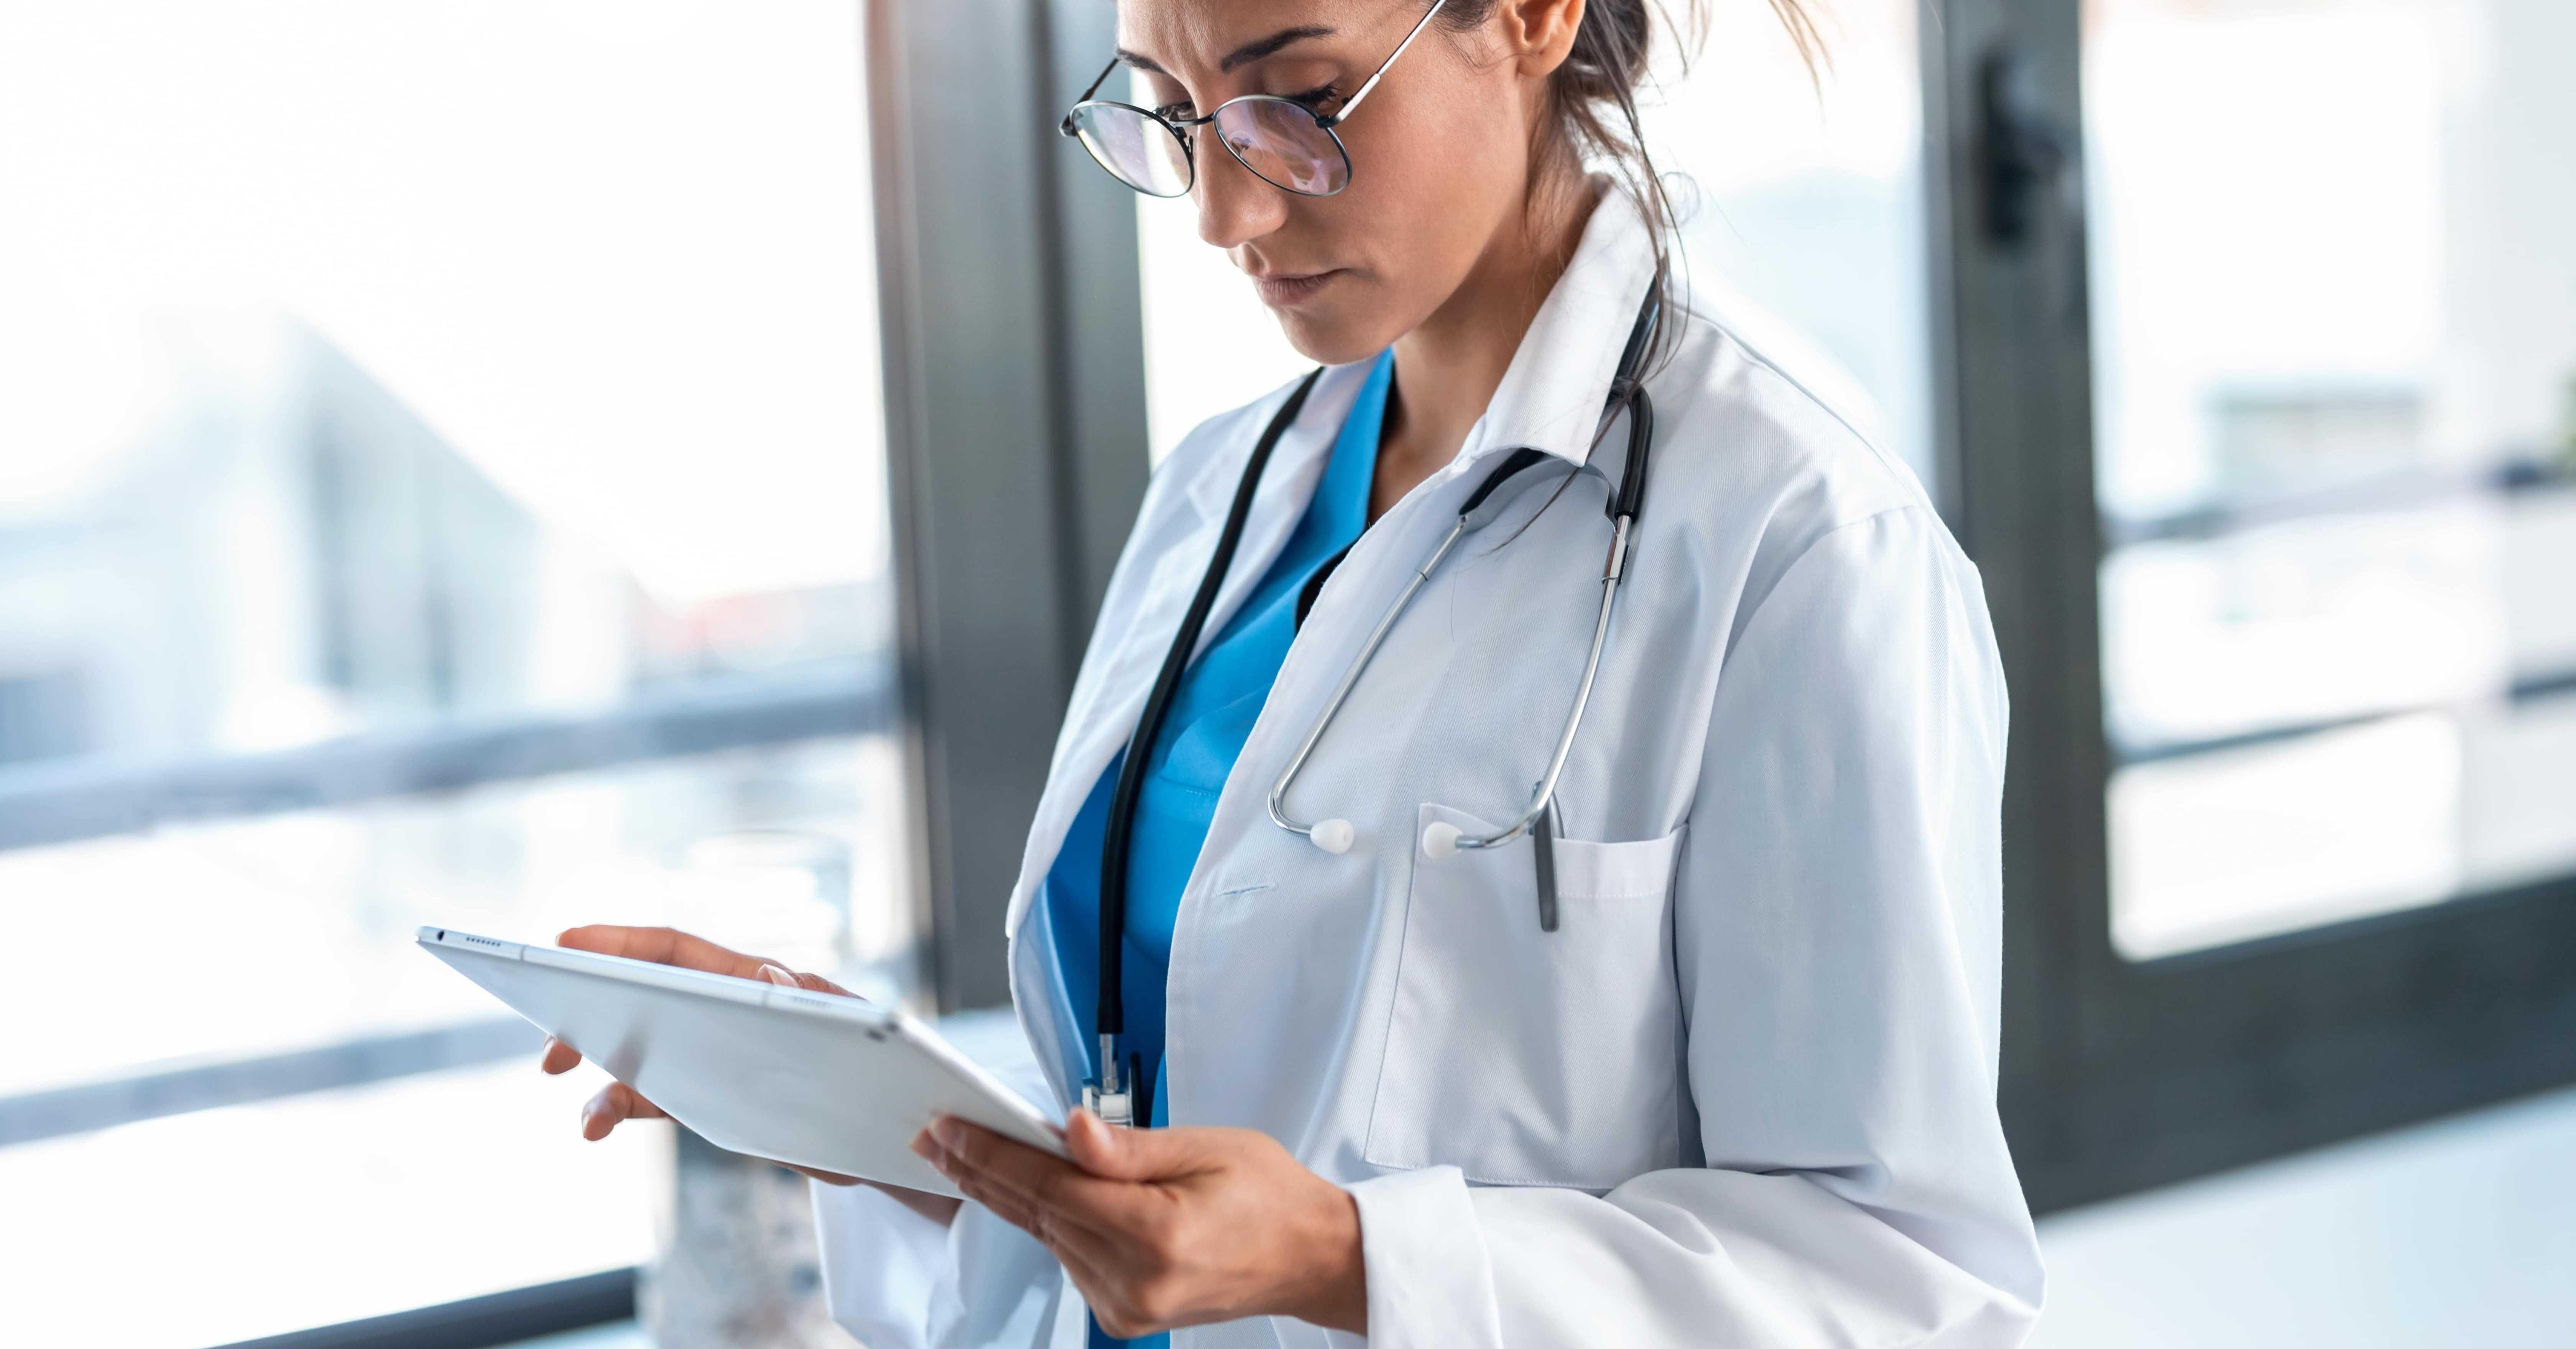 doctor using hospital wifi